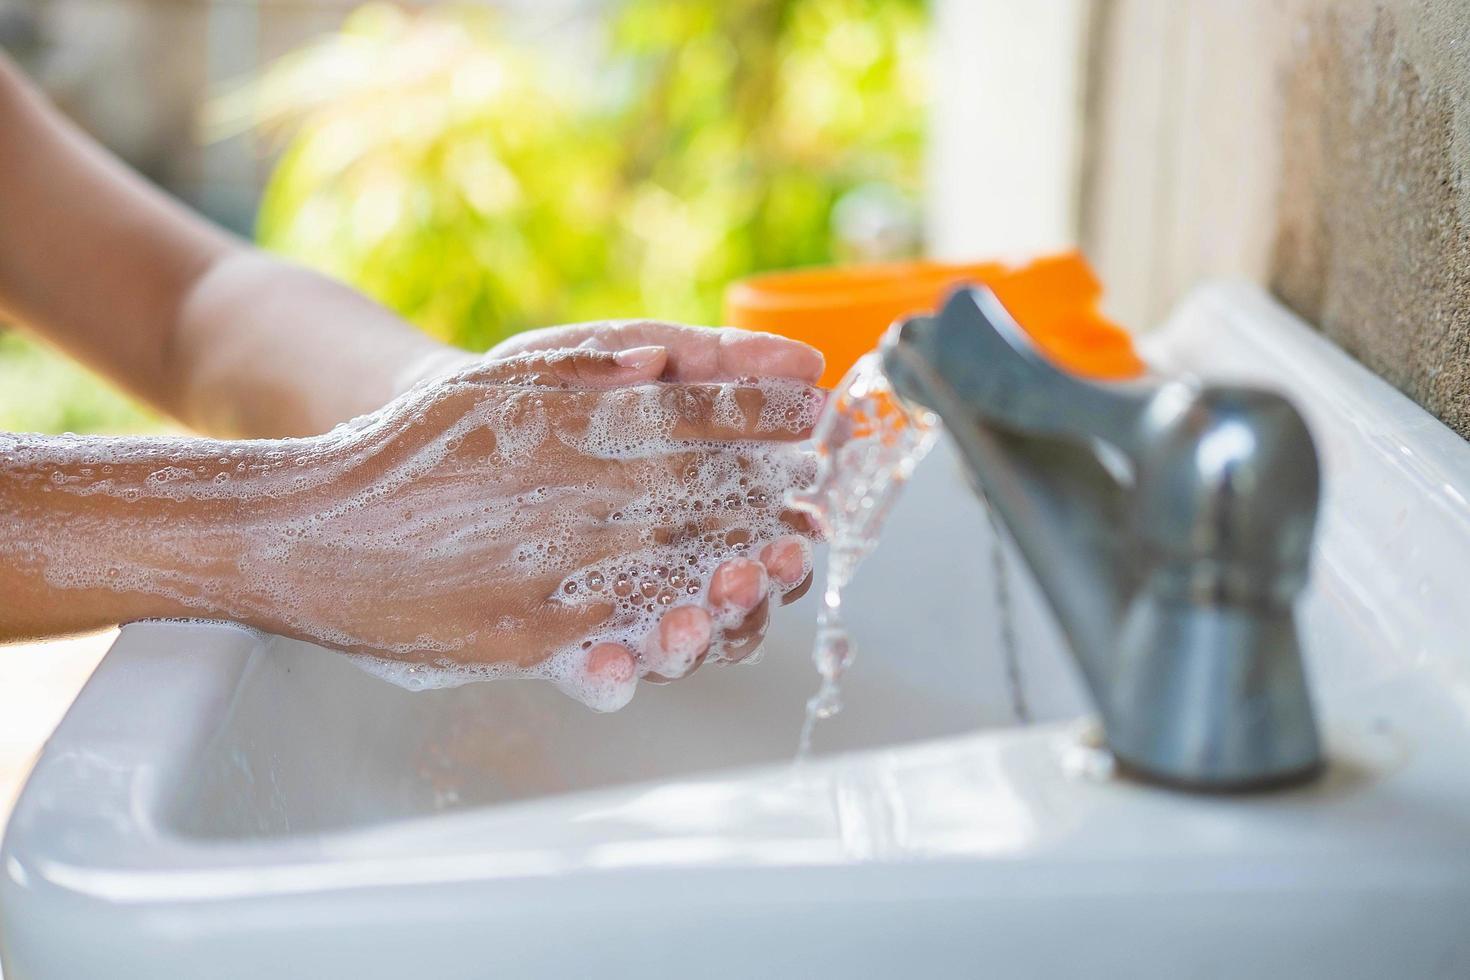 lavarse las manos con jabón para prevenir el coronavirus foto